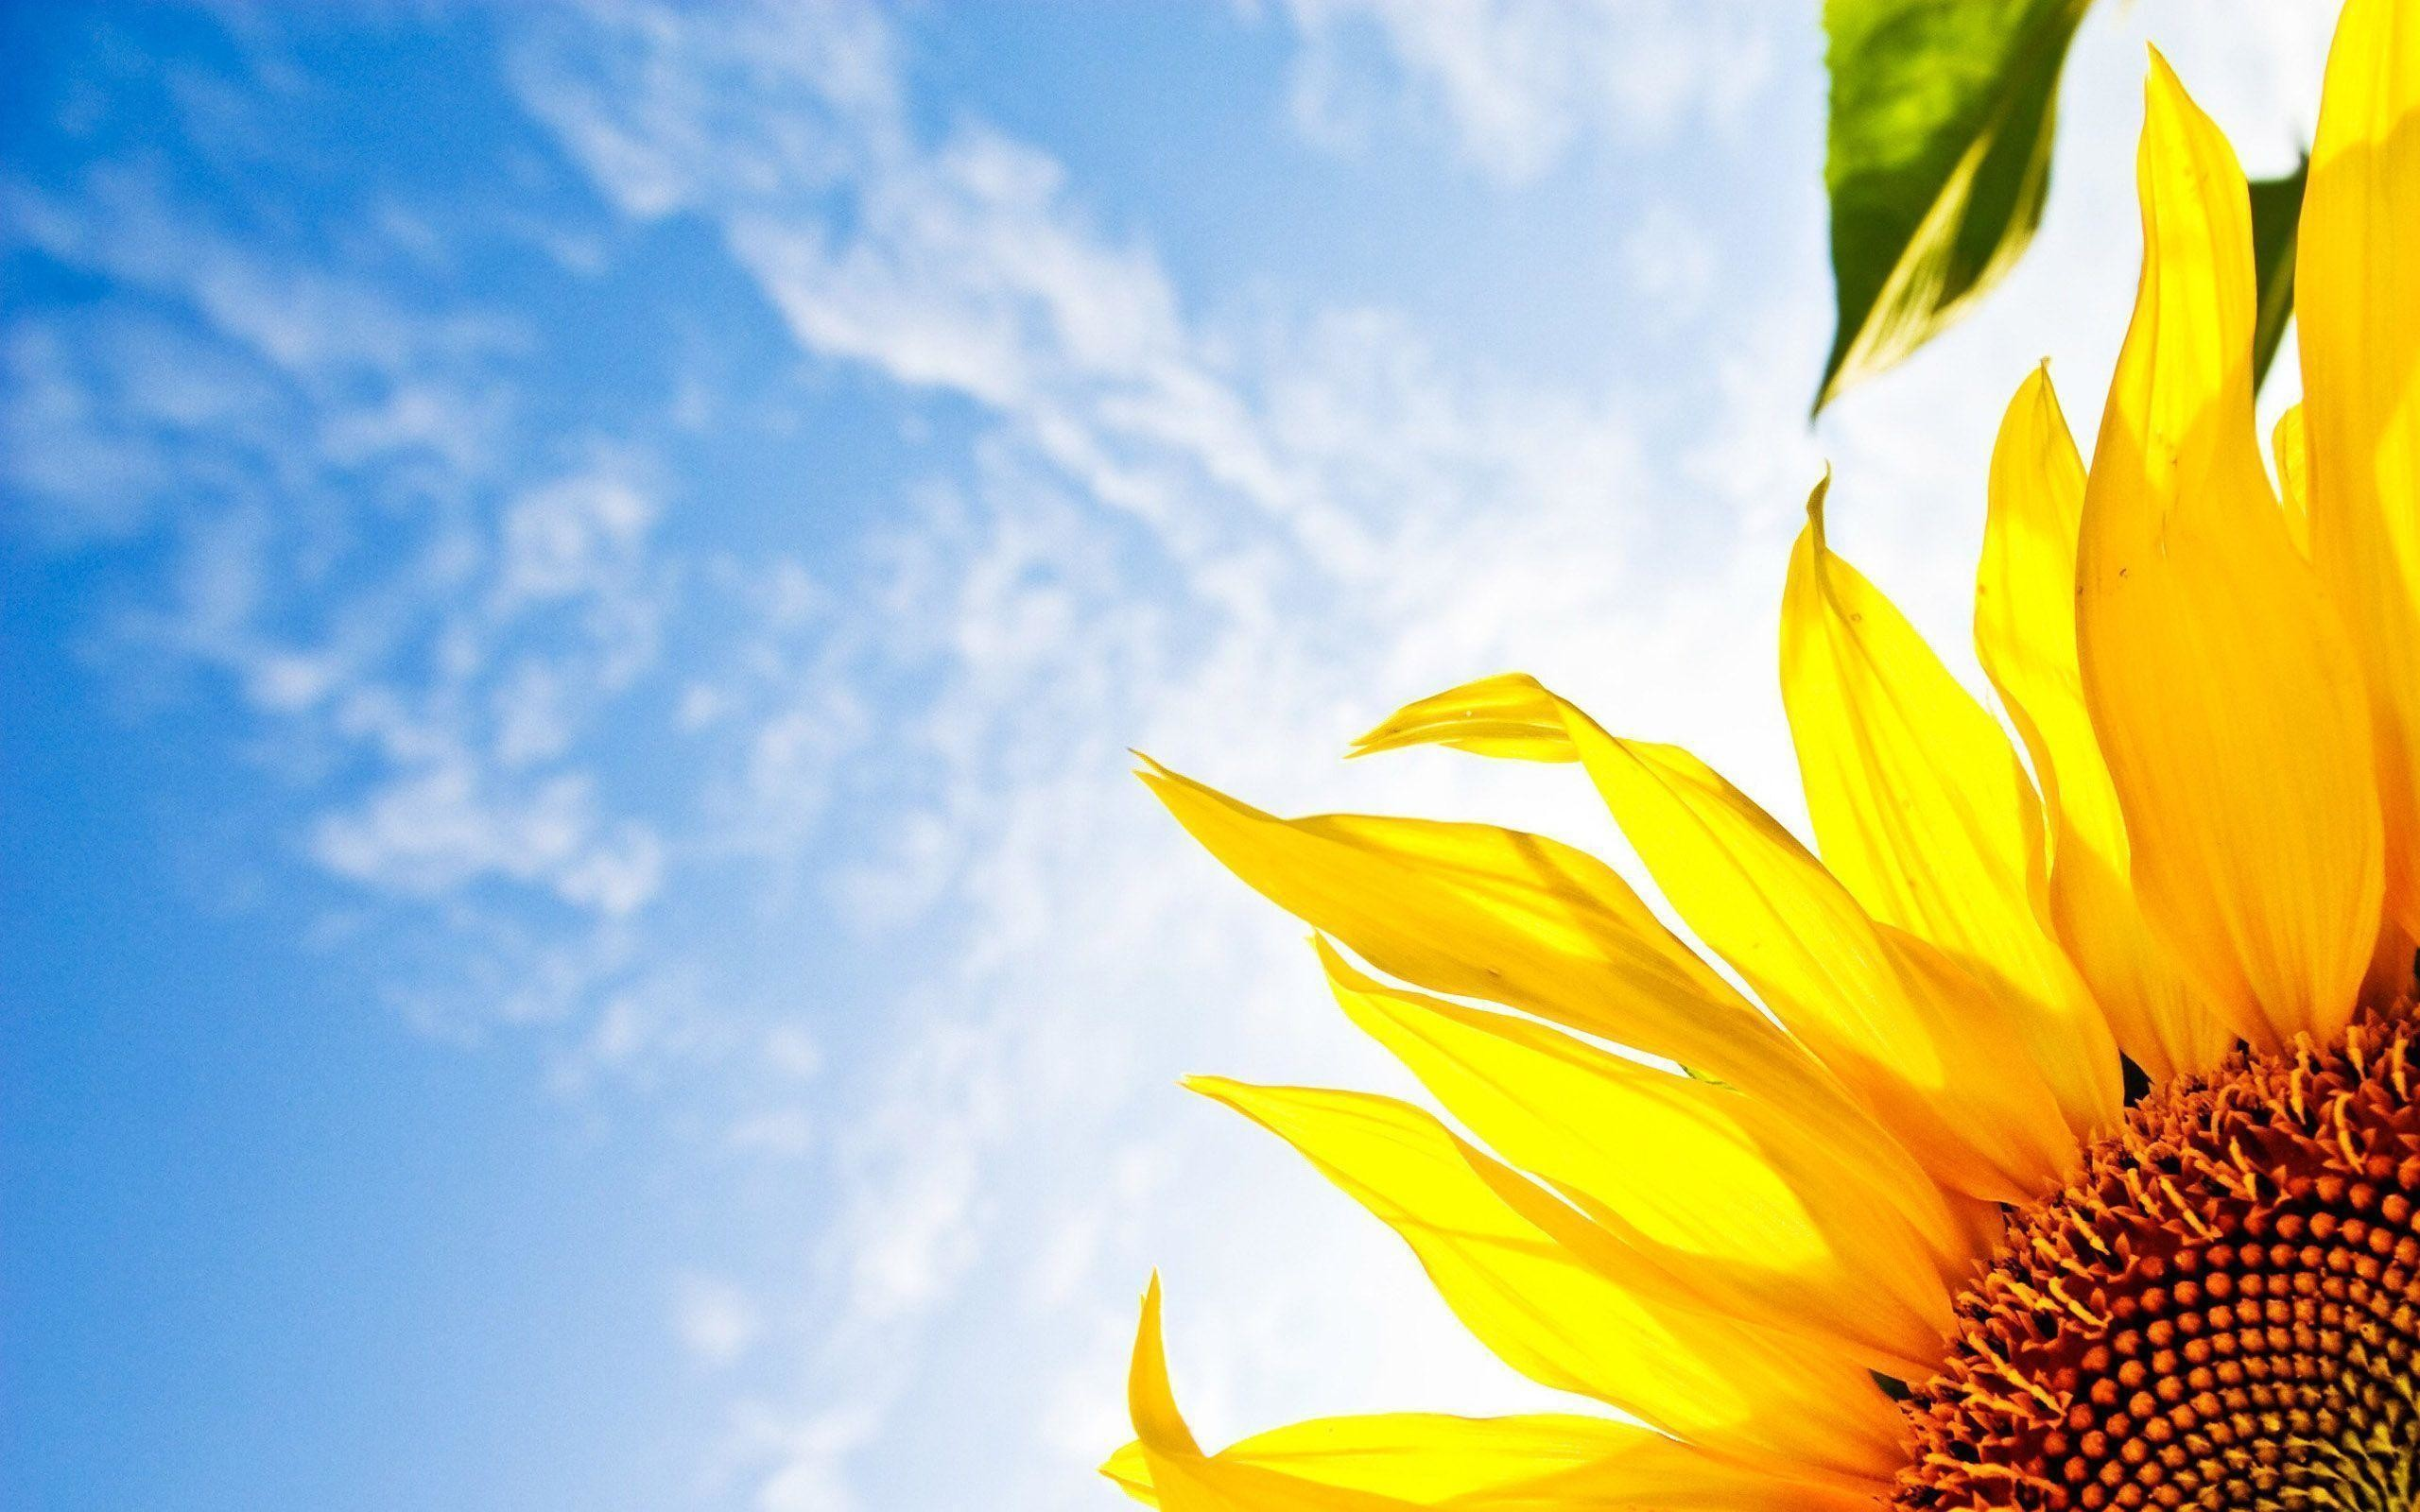 Sunflower Wallpapers Trumpwallpapers